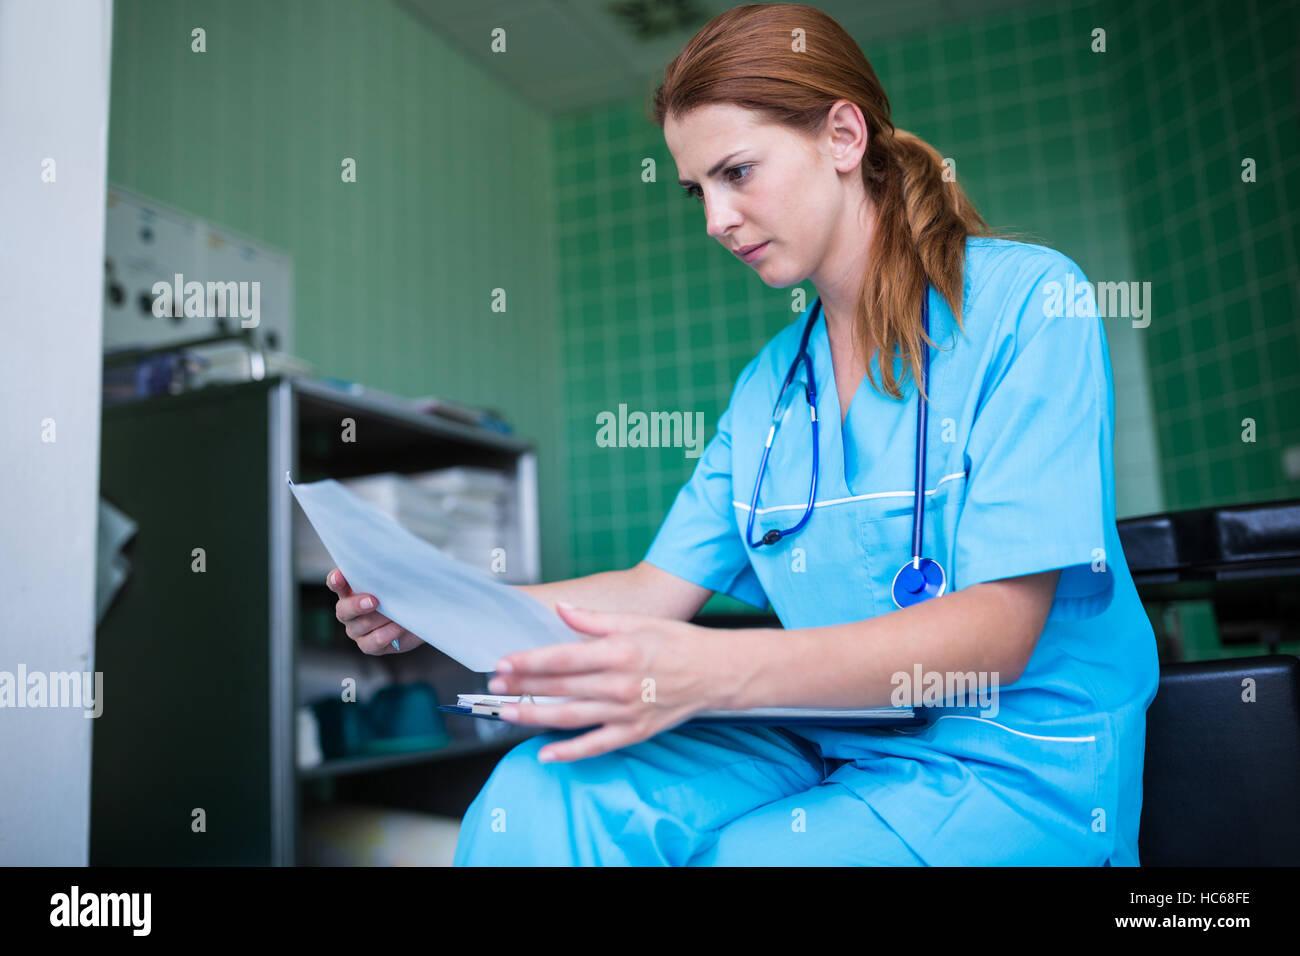 Nurse checking medical report - Stock Image